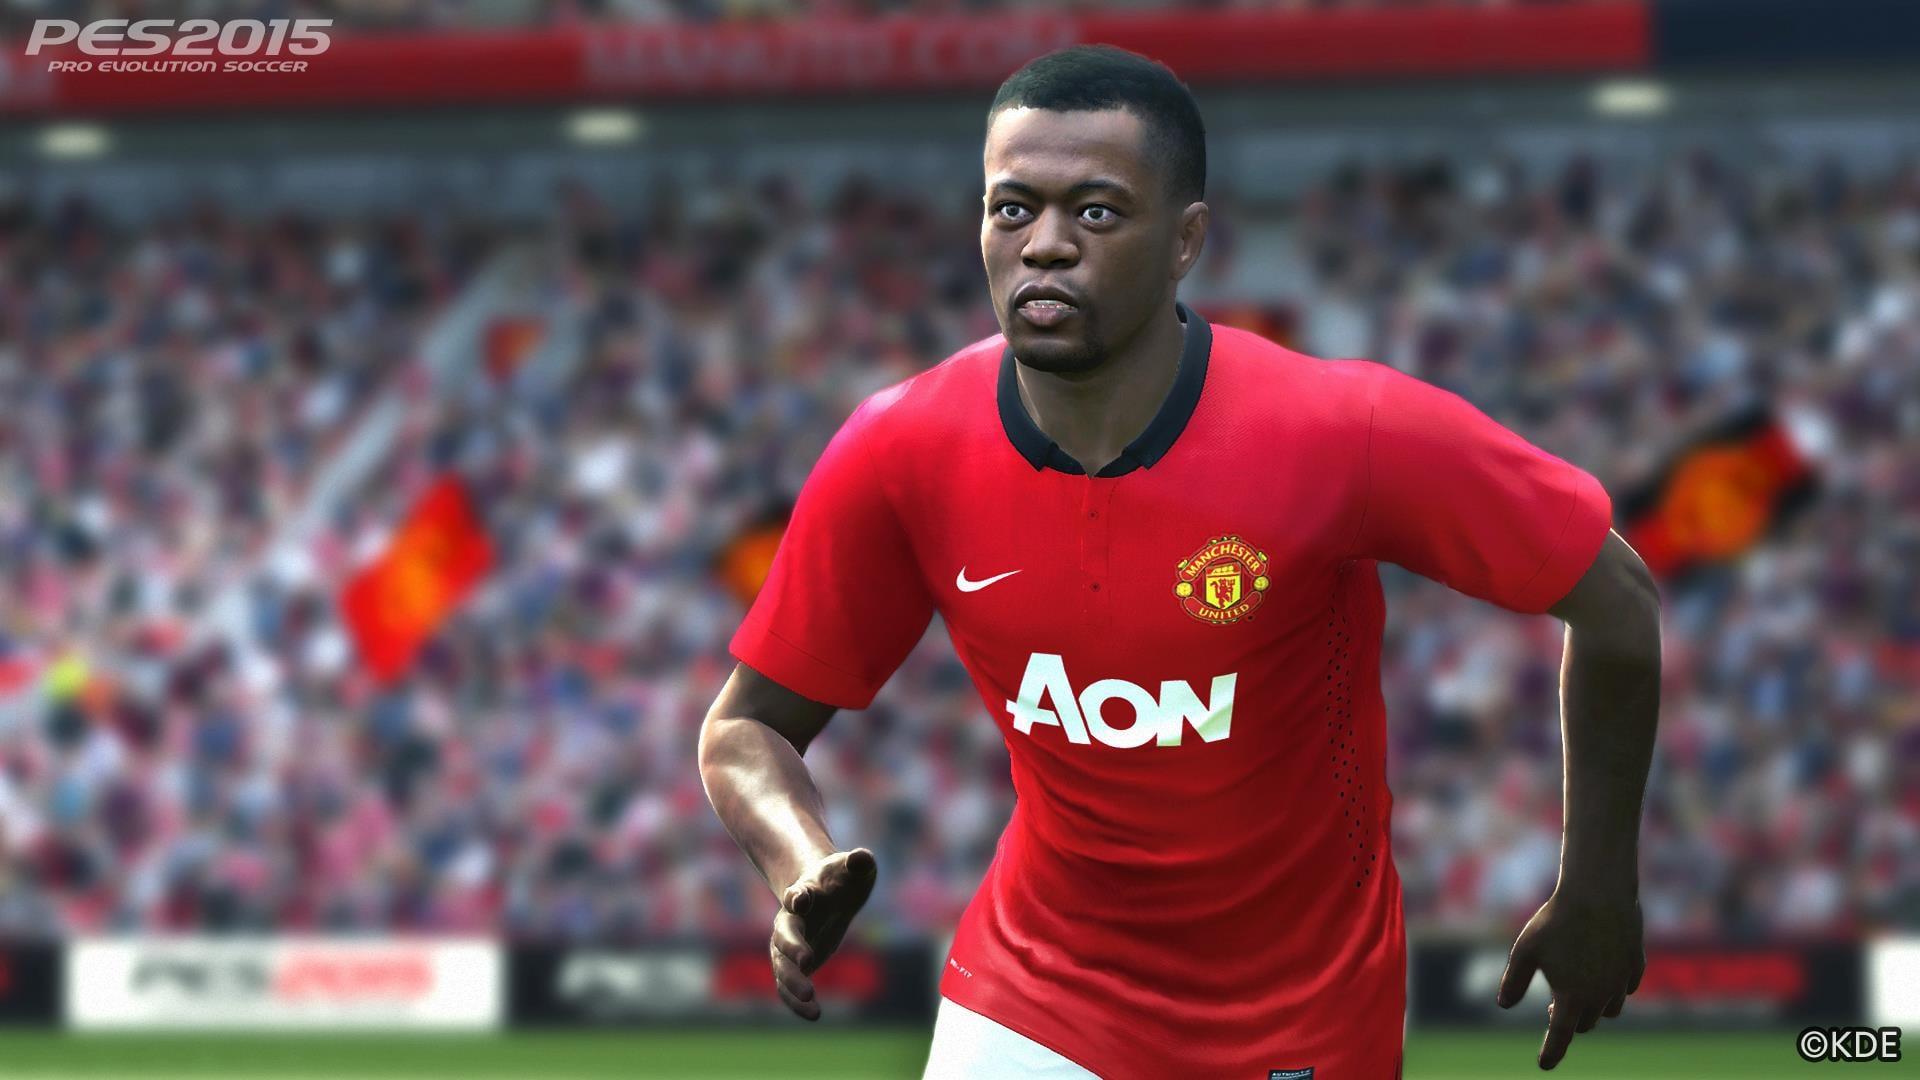 Pro Evolution Soccer 2015 Improvements Detailed